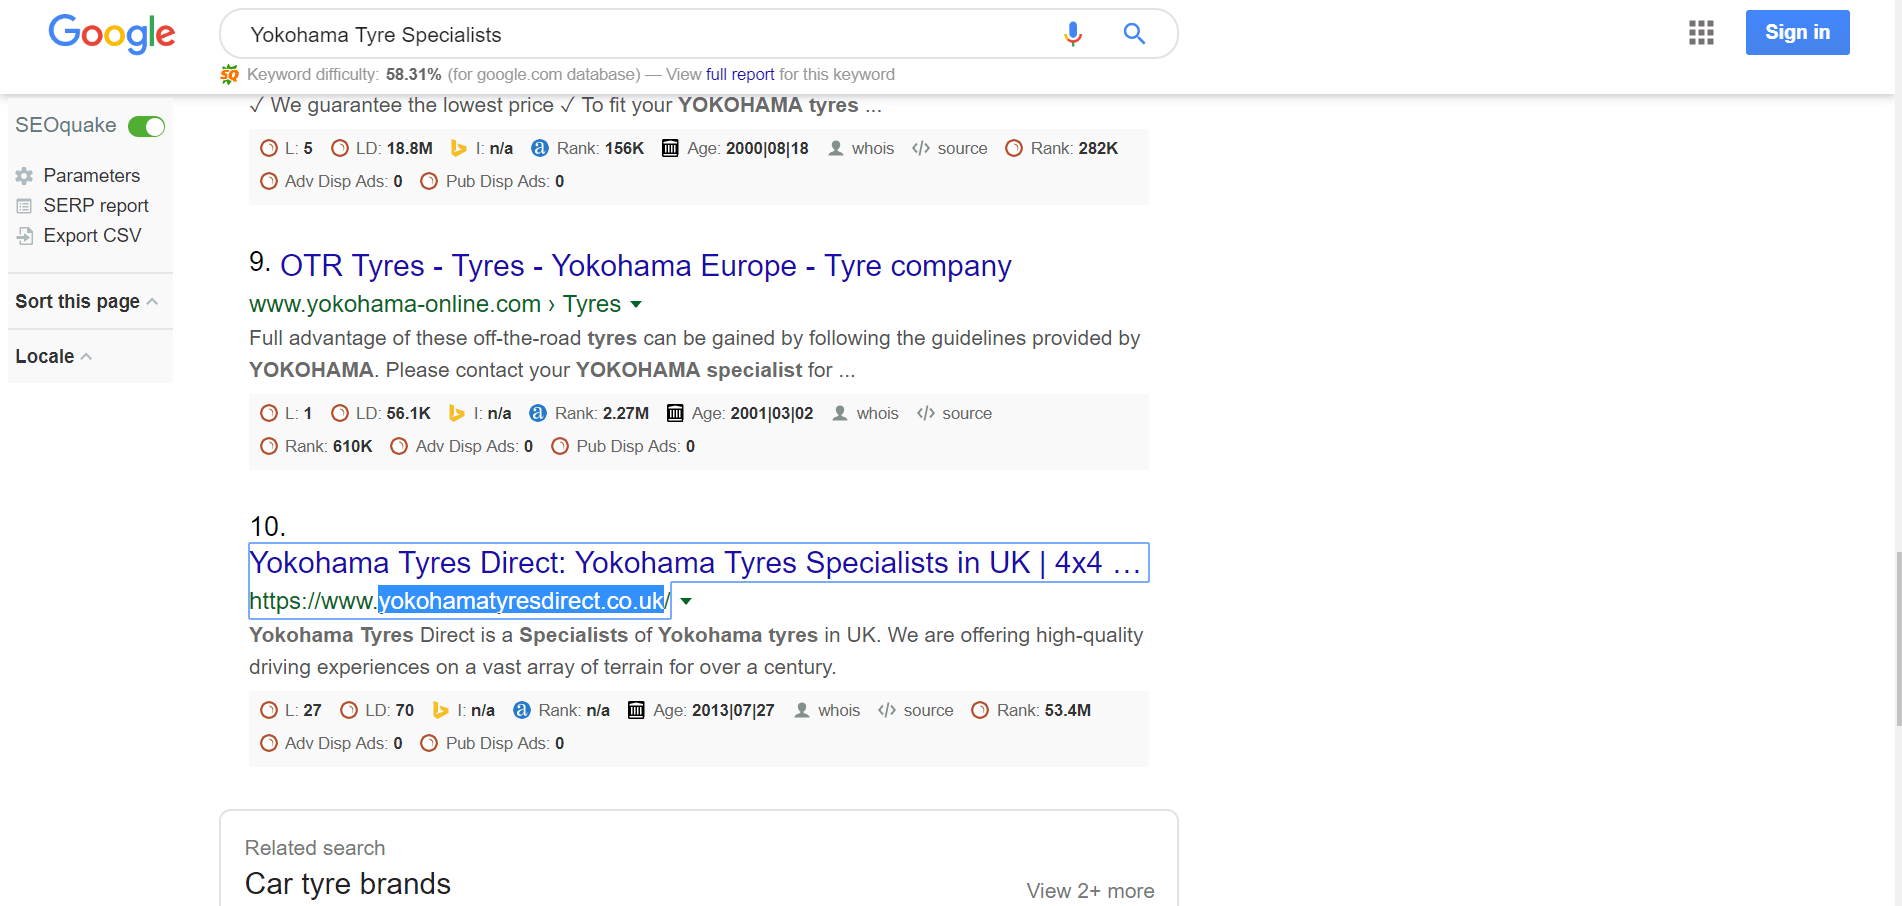 Yokohama Tyre Specialists